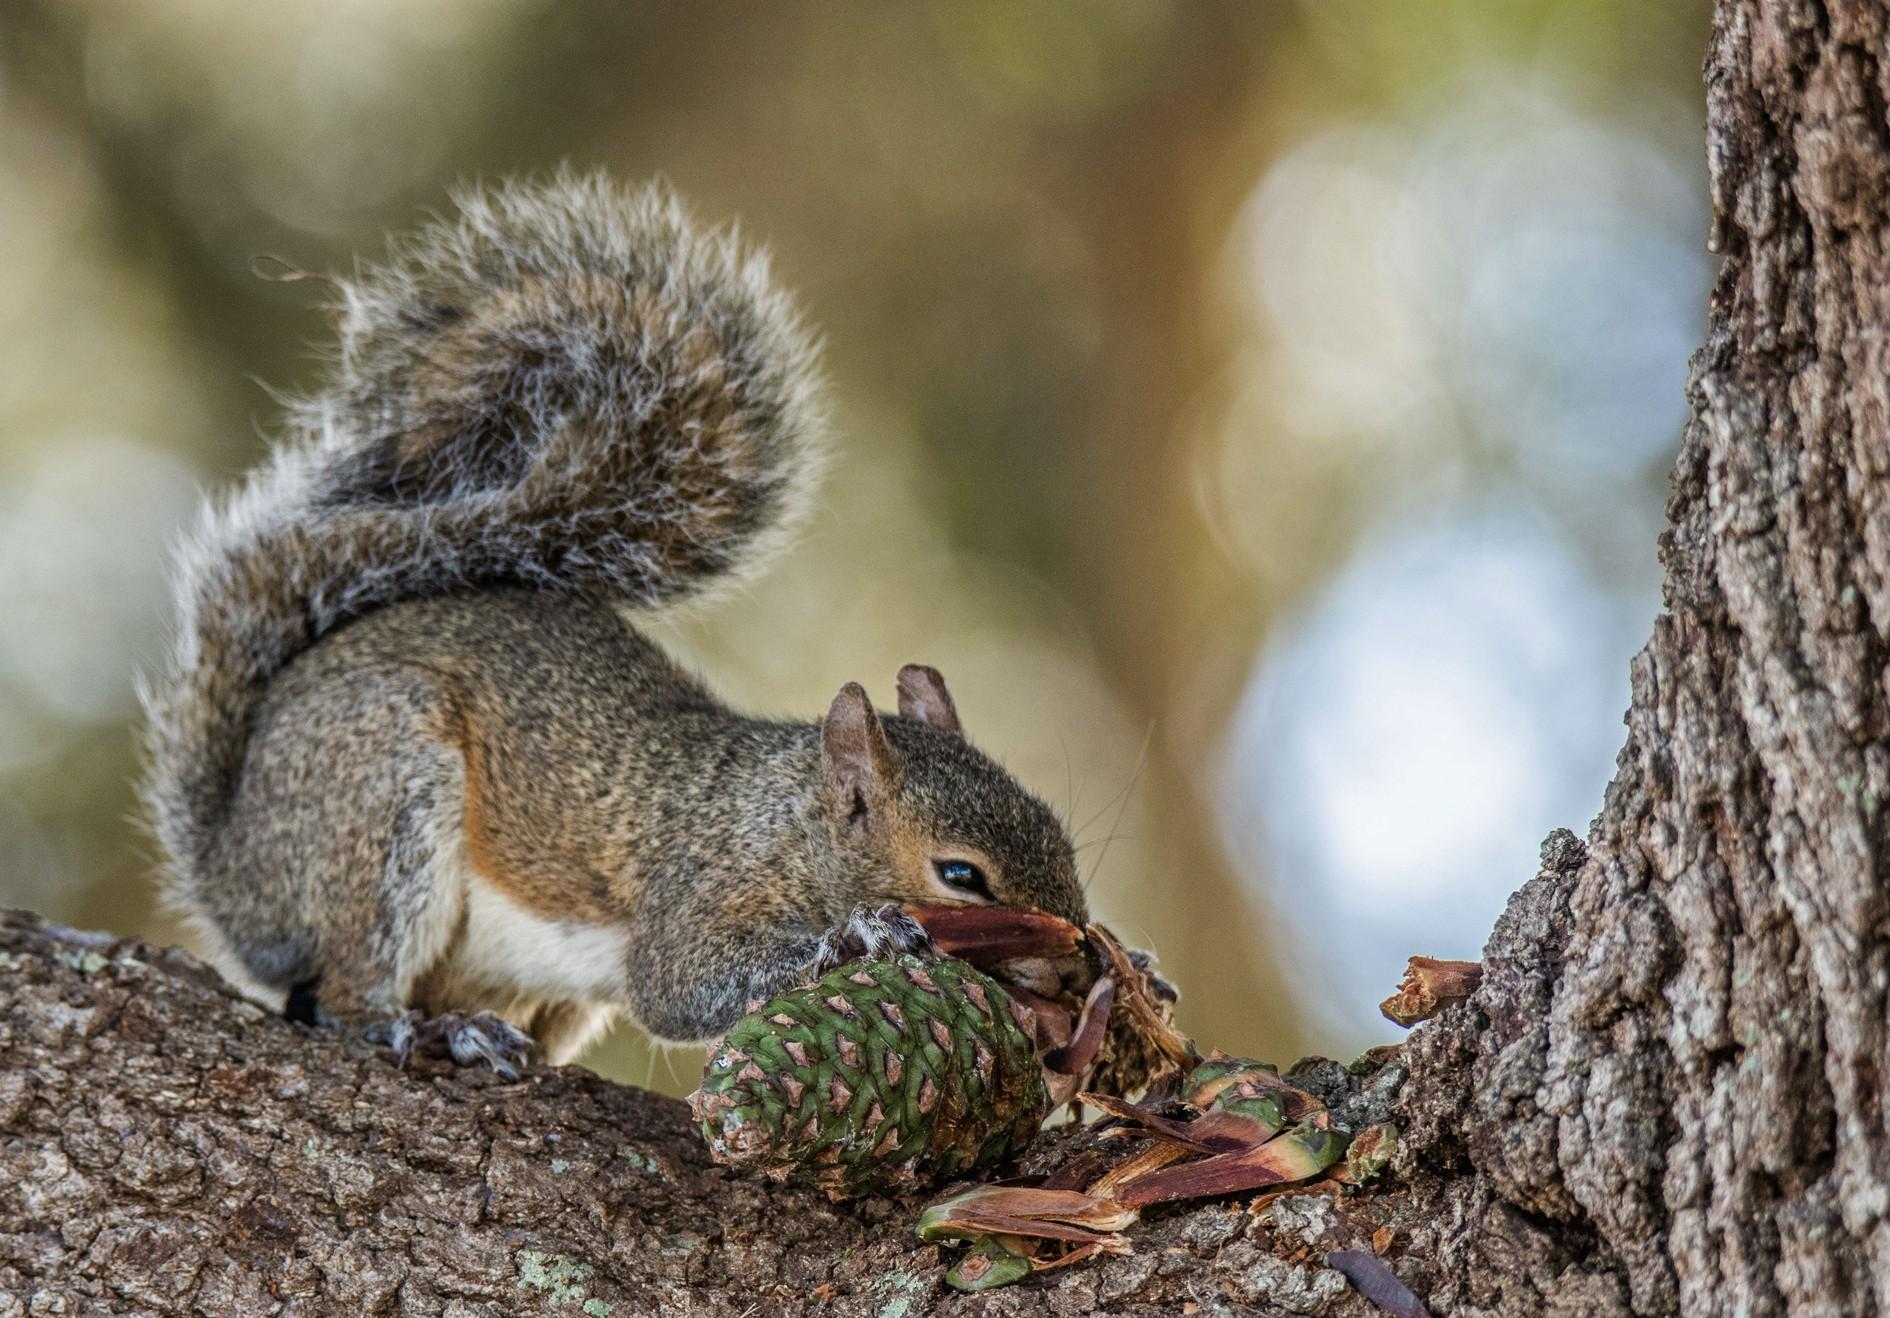 983-Squirrel-eating-pine-nuts-(2)-f.jpg